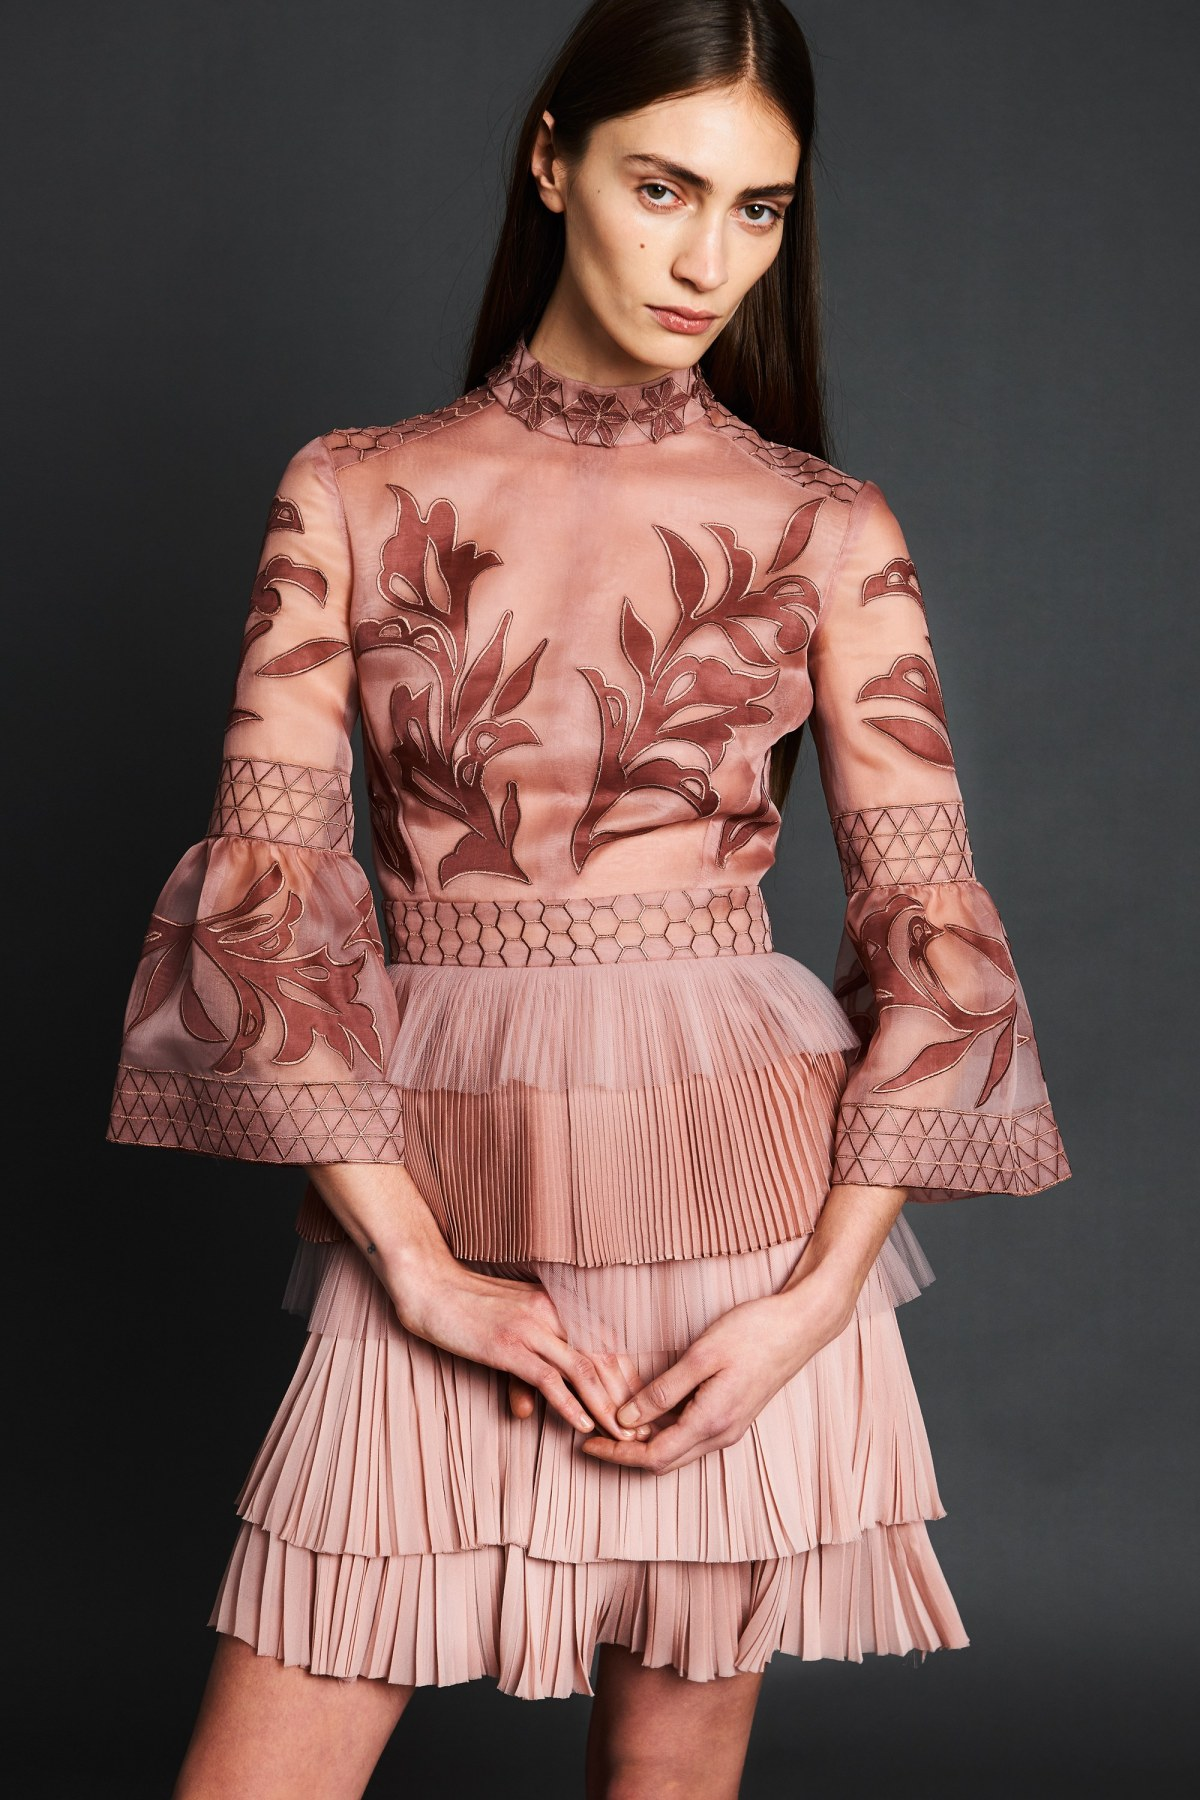 j-mendel-pre-fall-2017-fashion-show-the-impression-17